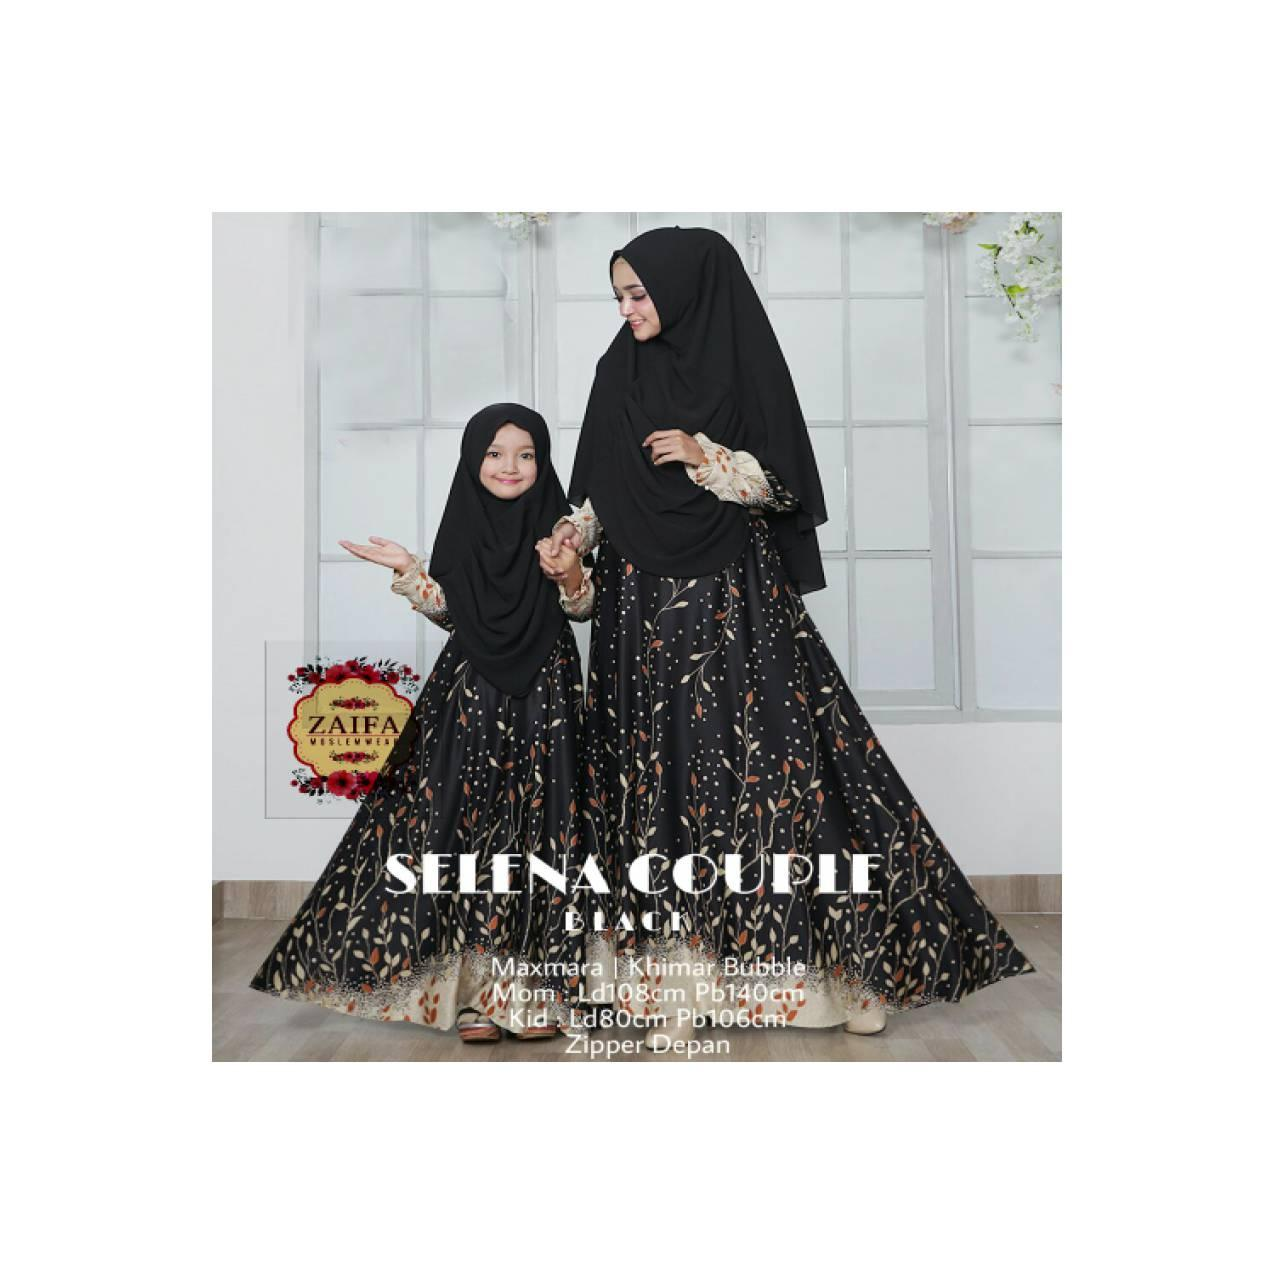 couple gamis dan jilbab syar i ibu dan anak mewah elegant baju musli